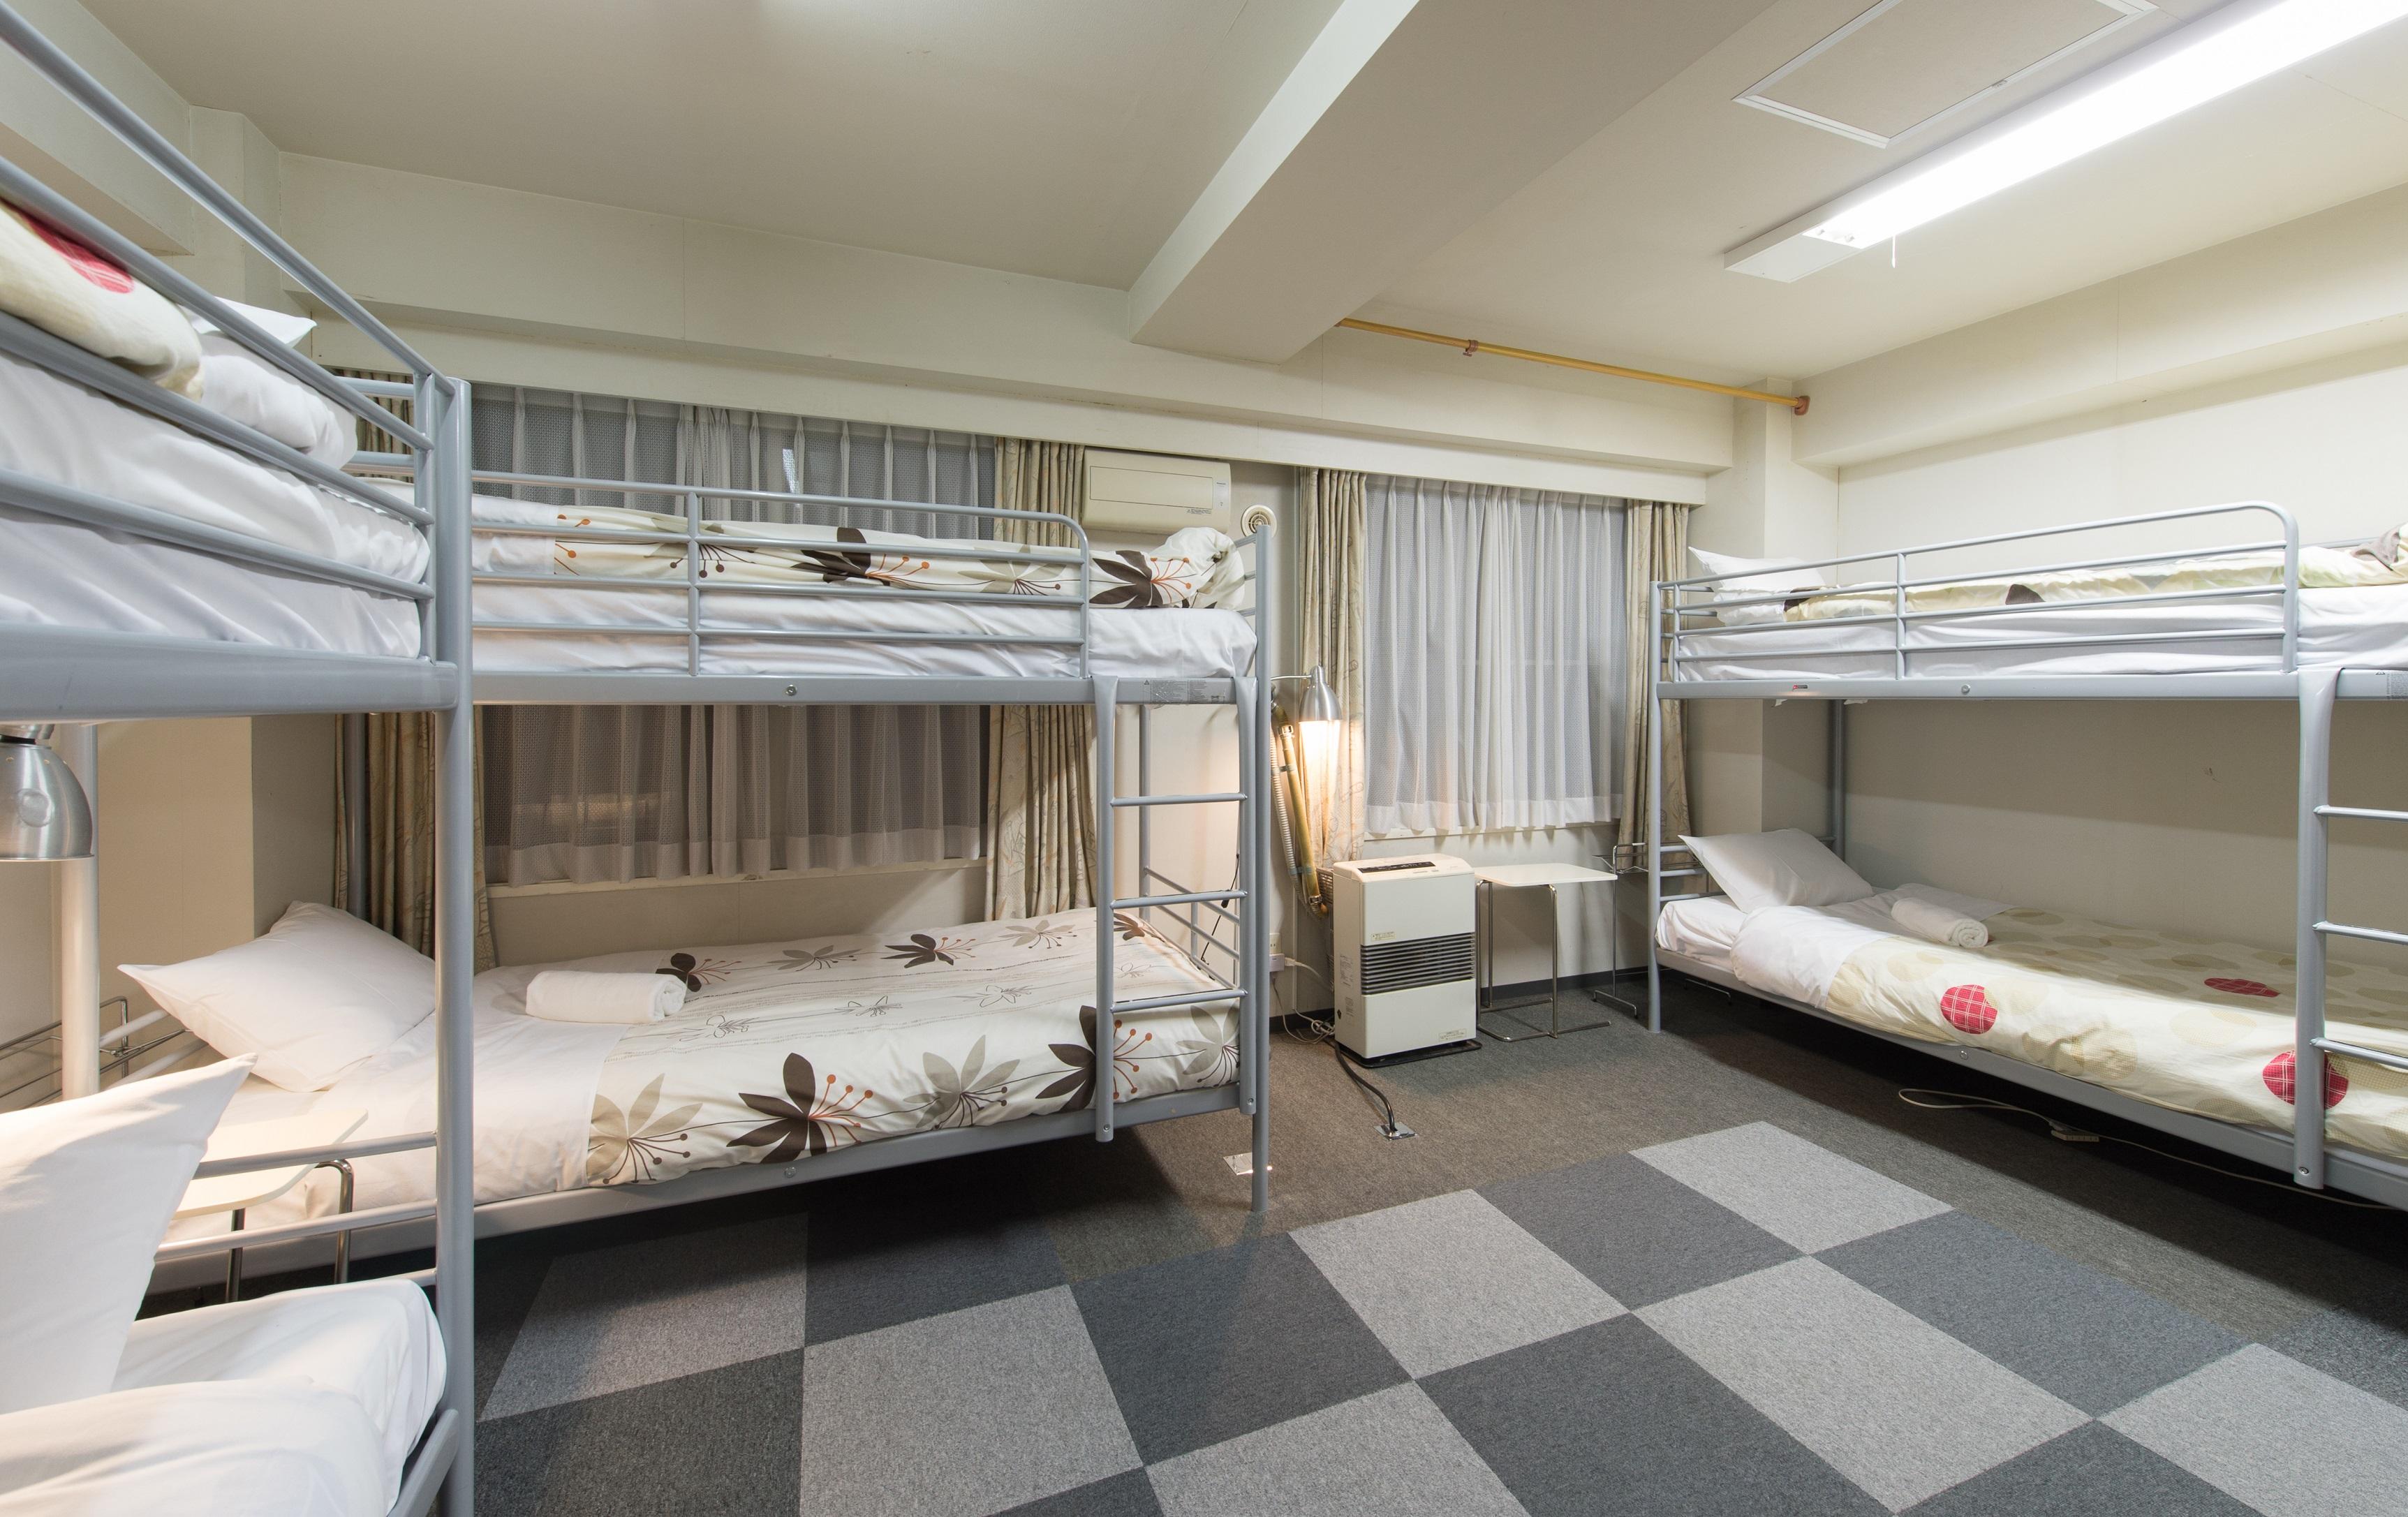 6 person dorm room